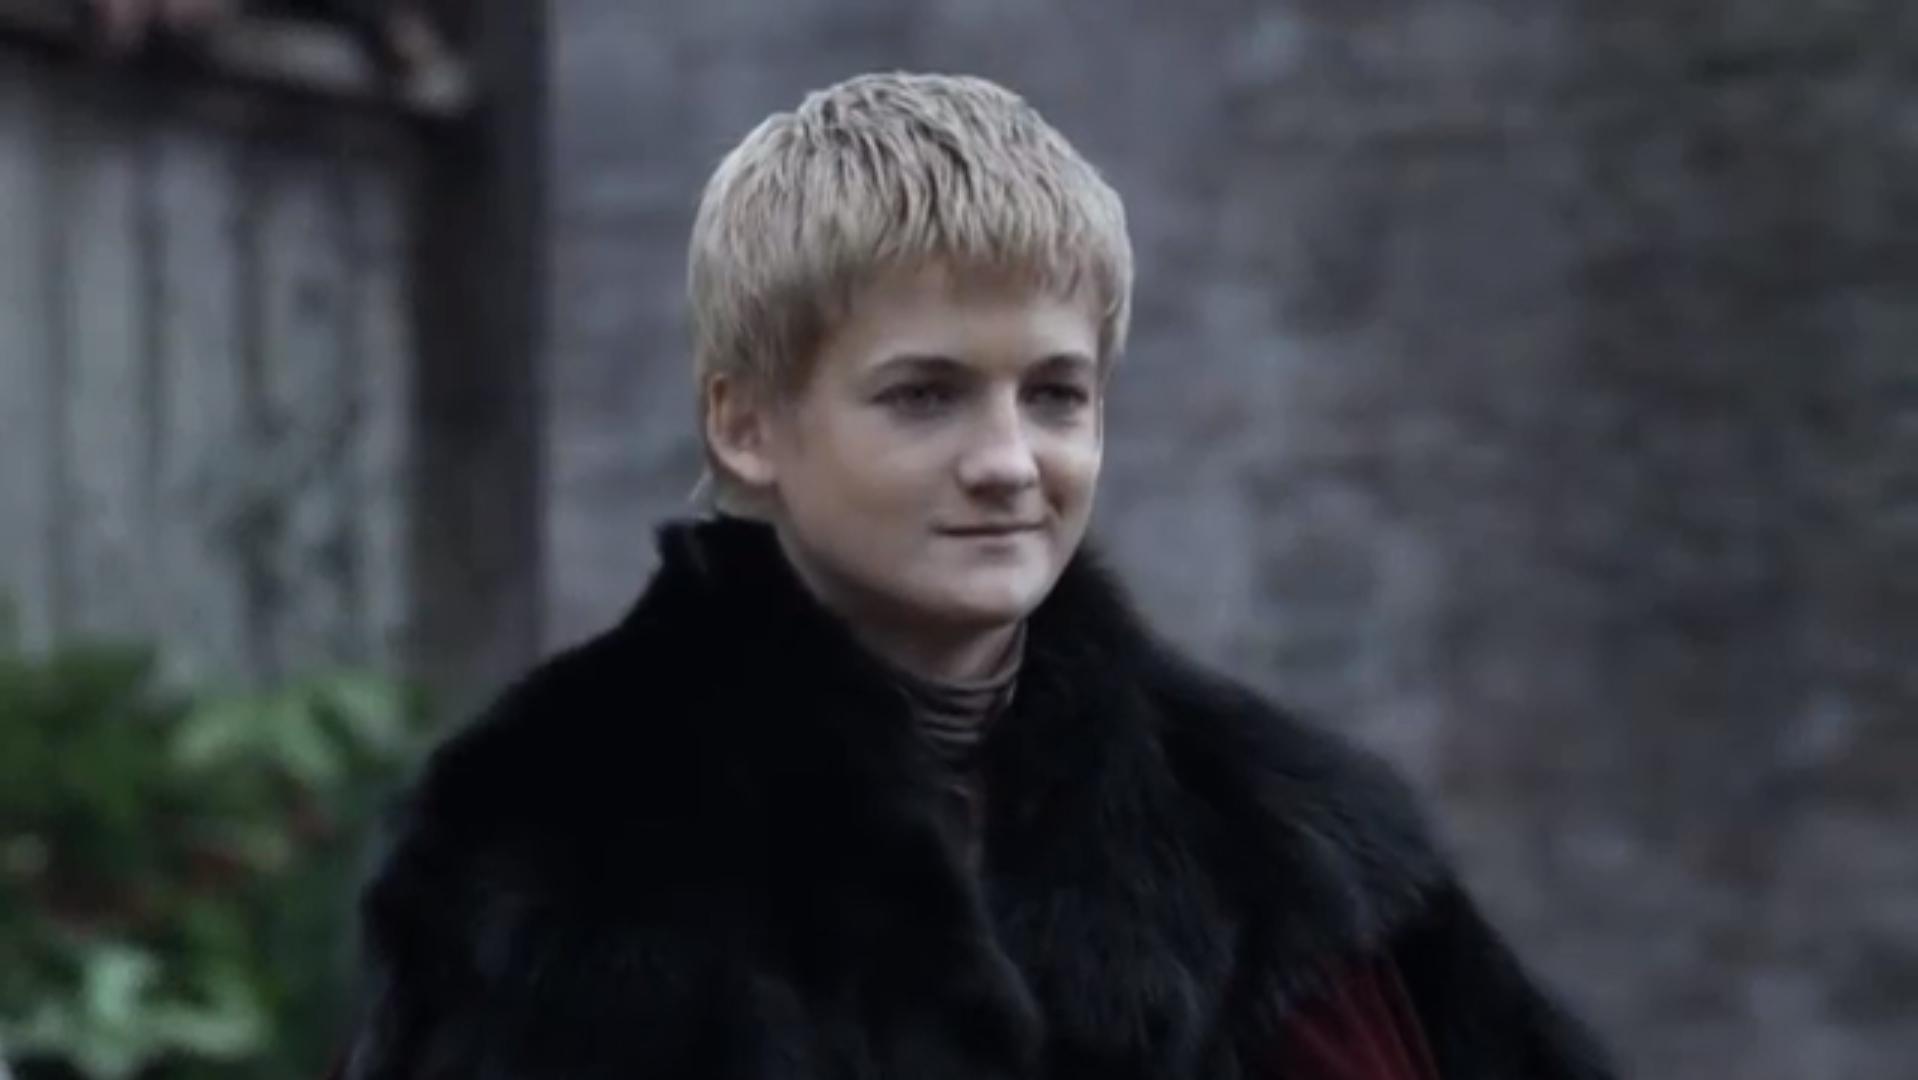 Joffrey Smiling - H 2015